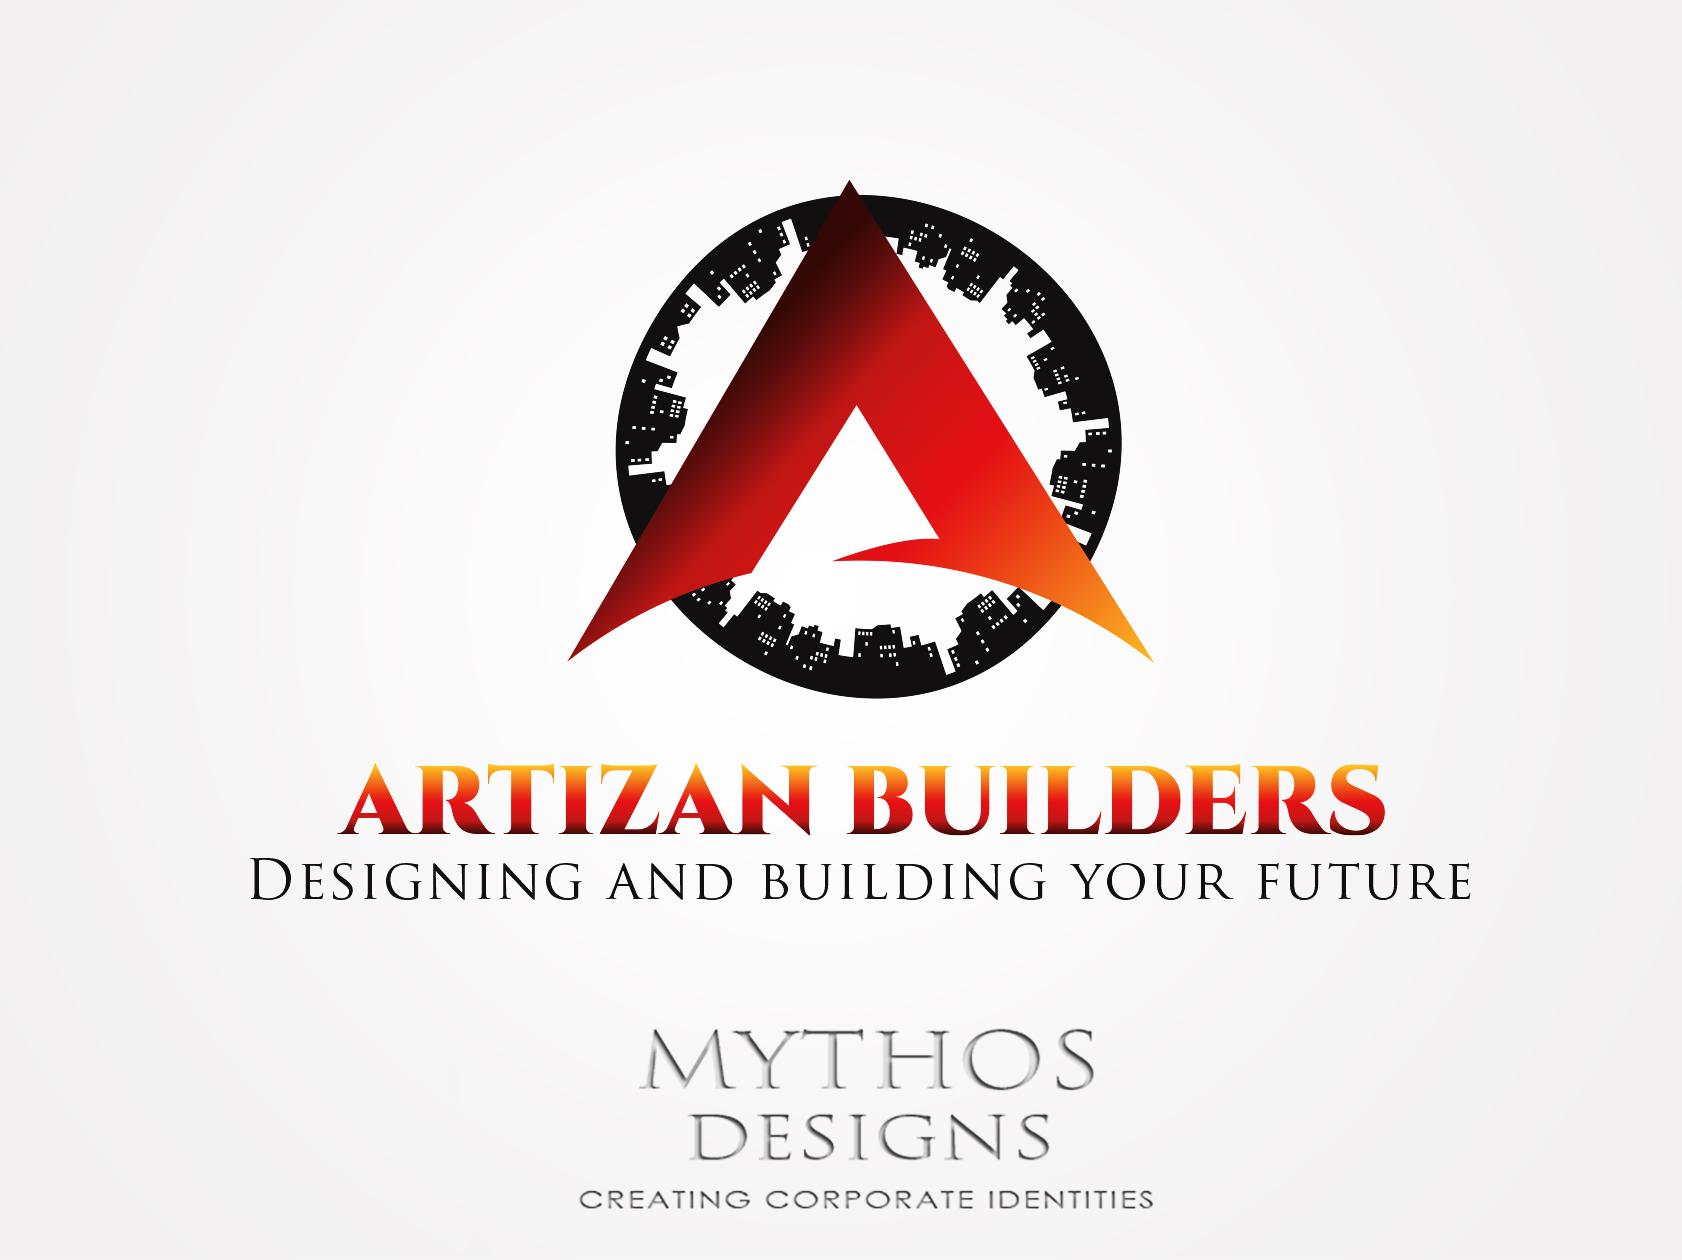 Logo Design by Mythos Designs - Entry No. 179 in the Logo Design Contest Captivating Logo Design for Artisan Builders.